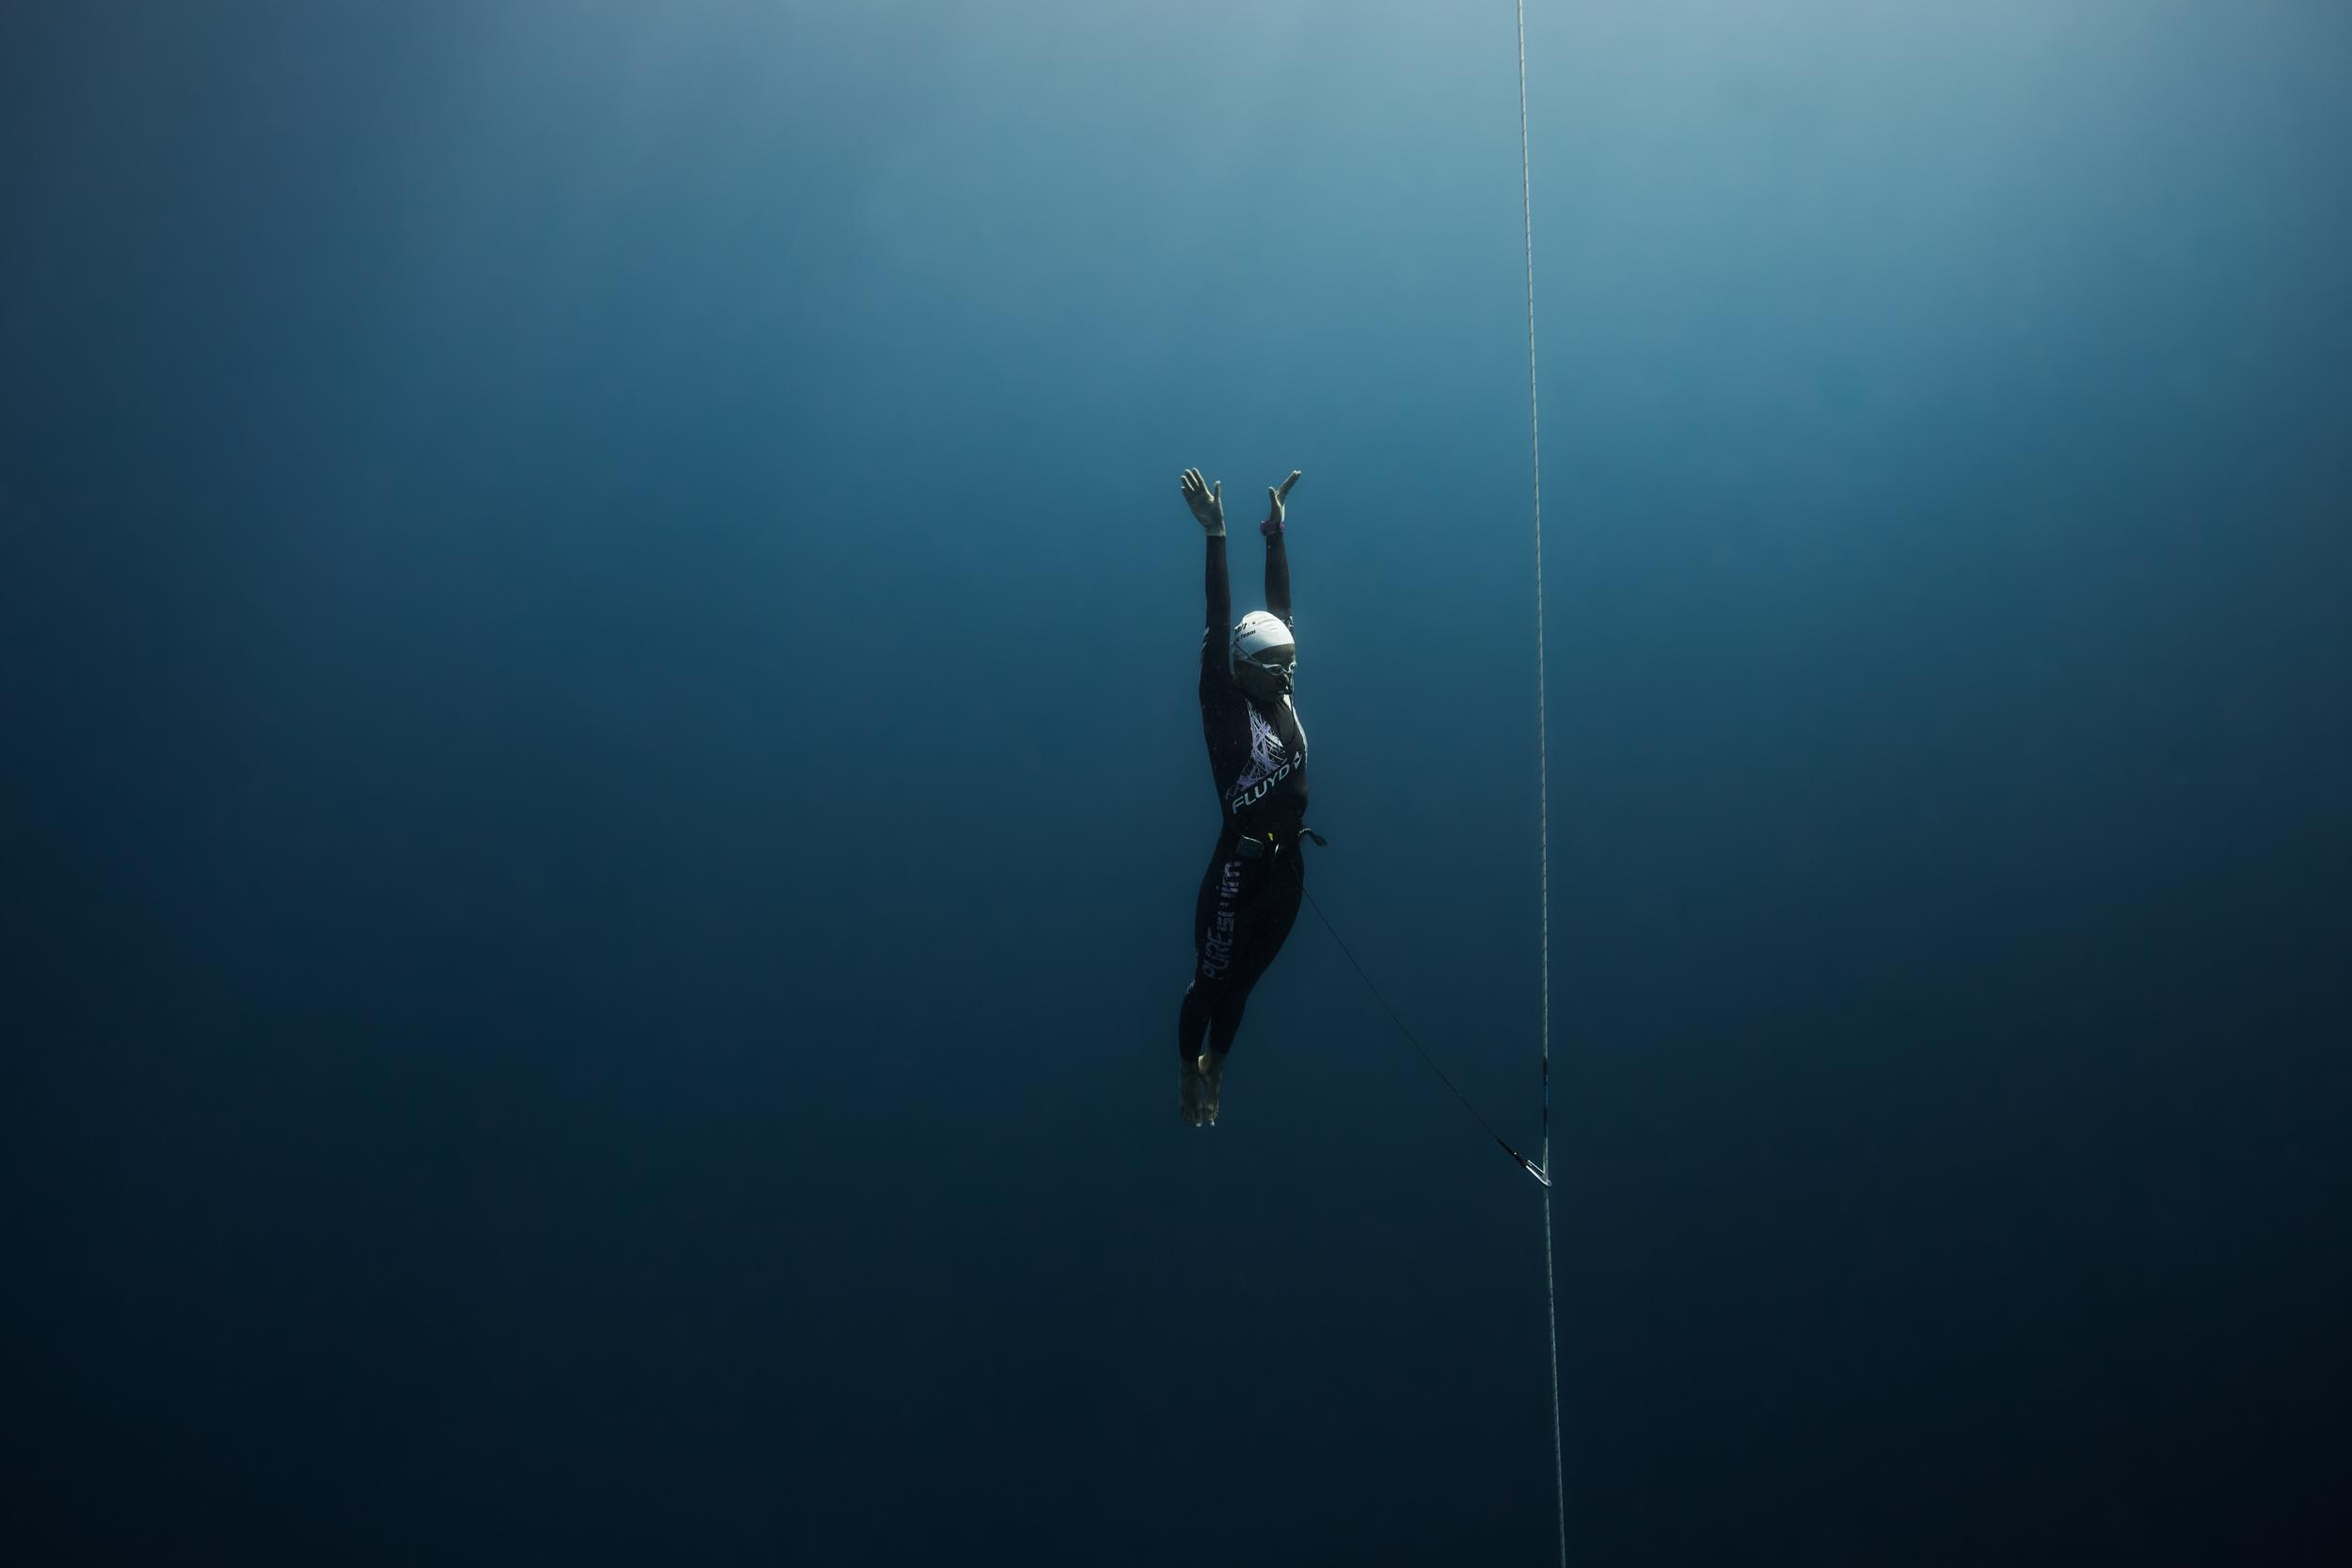 freediving-6.jpg